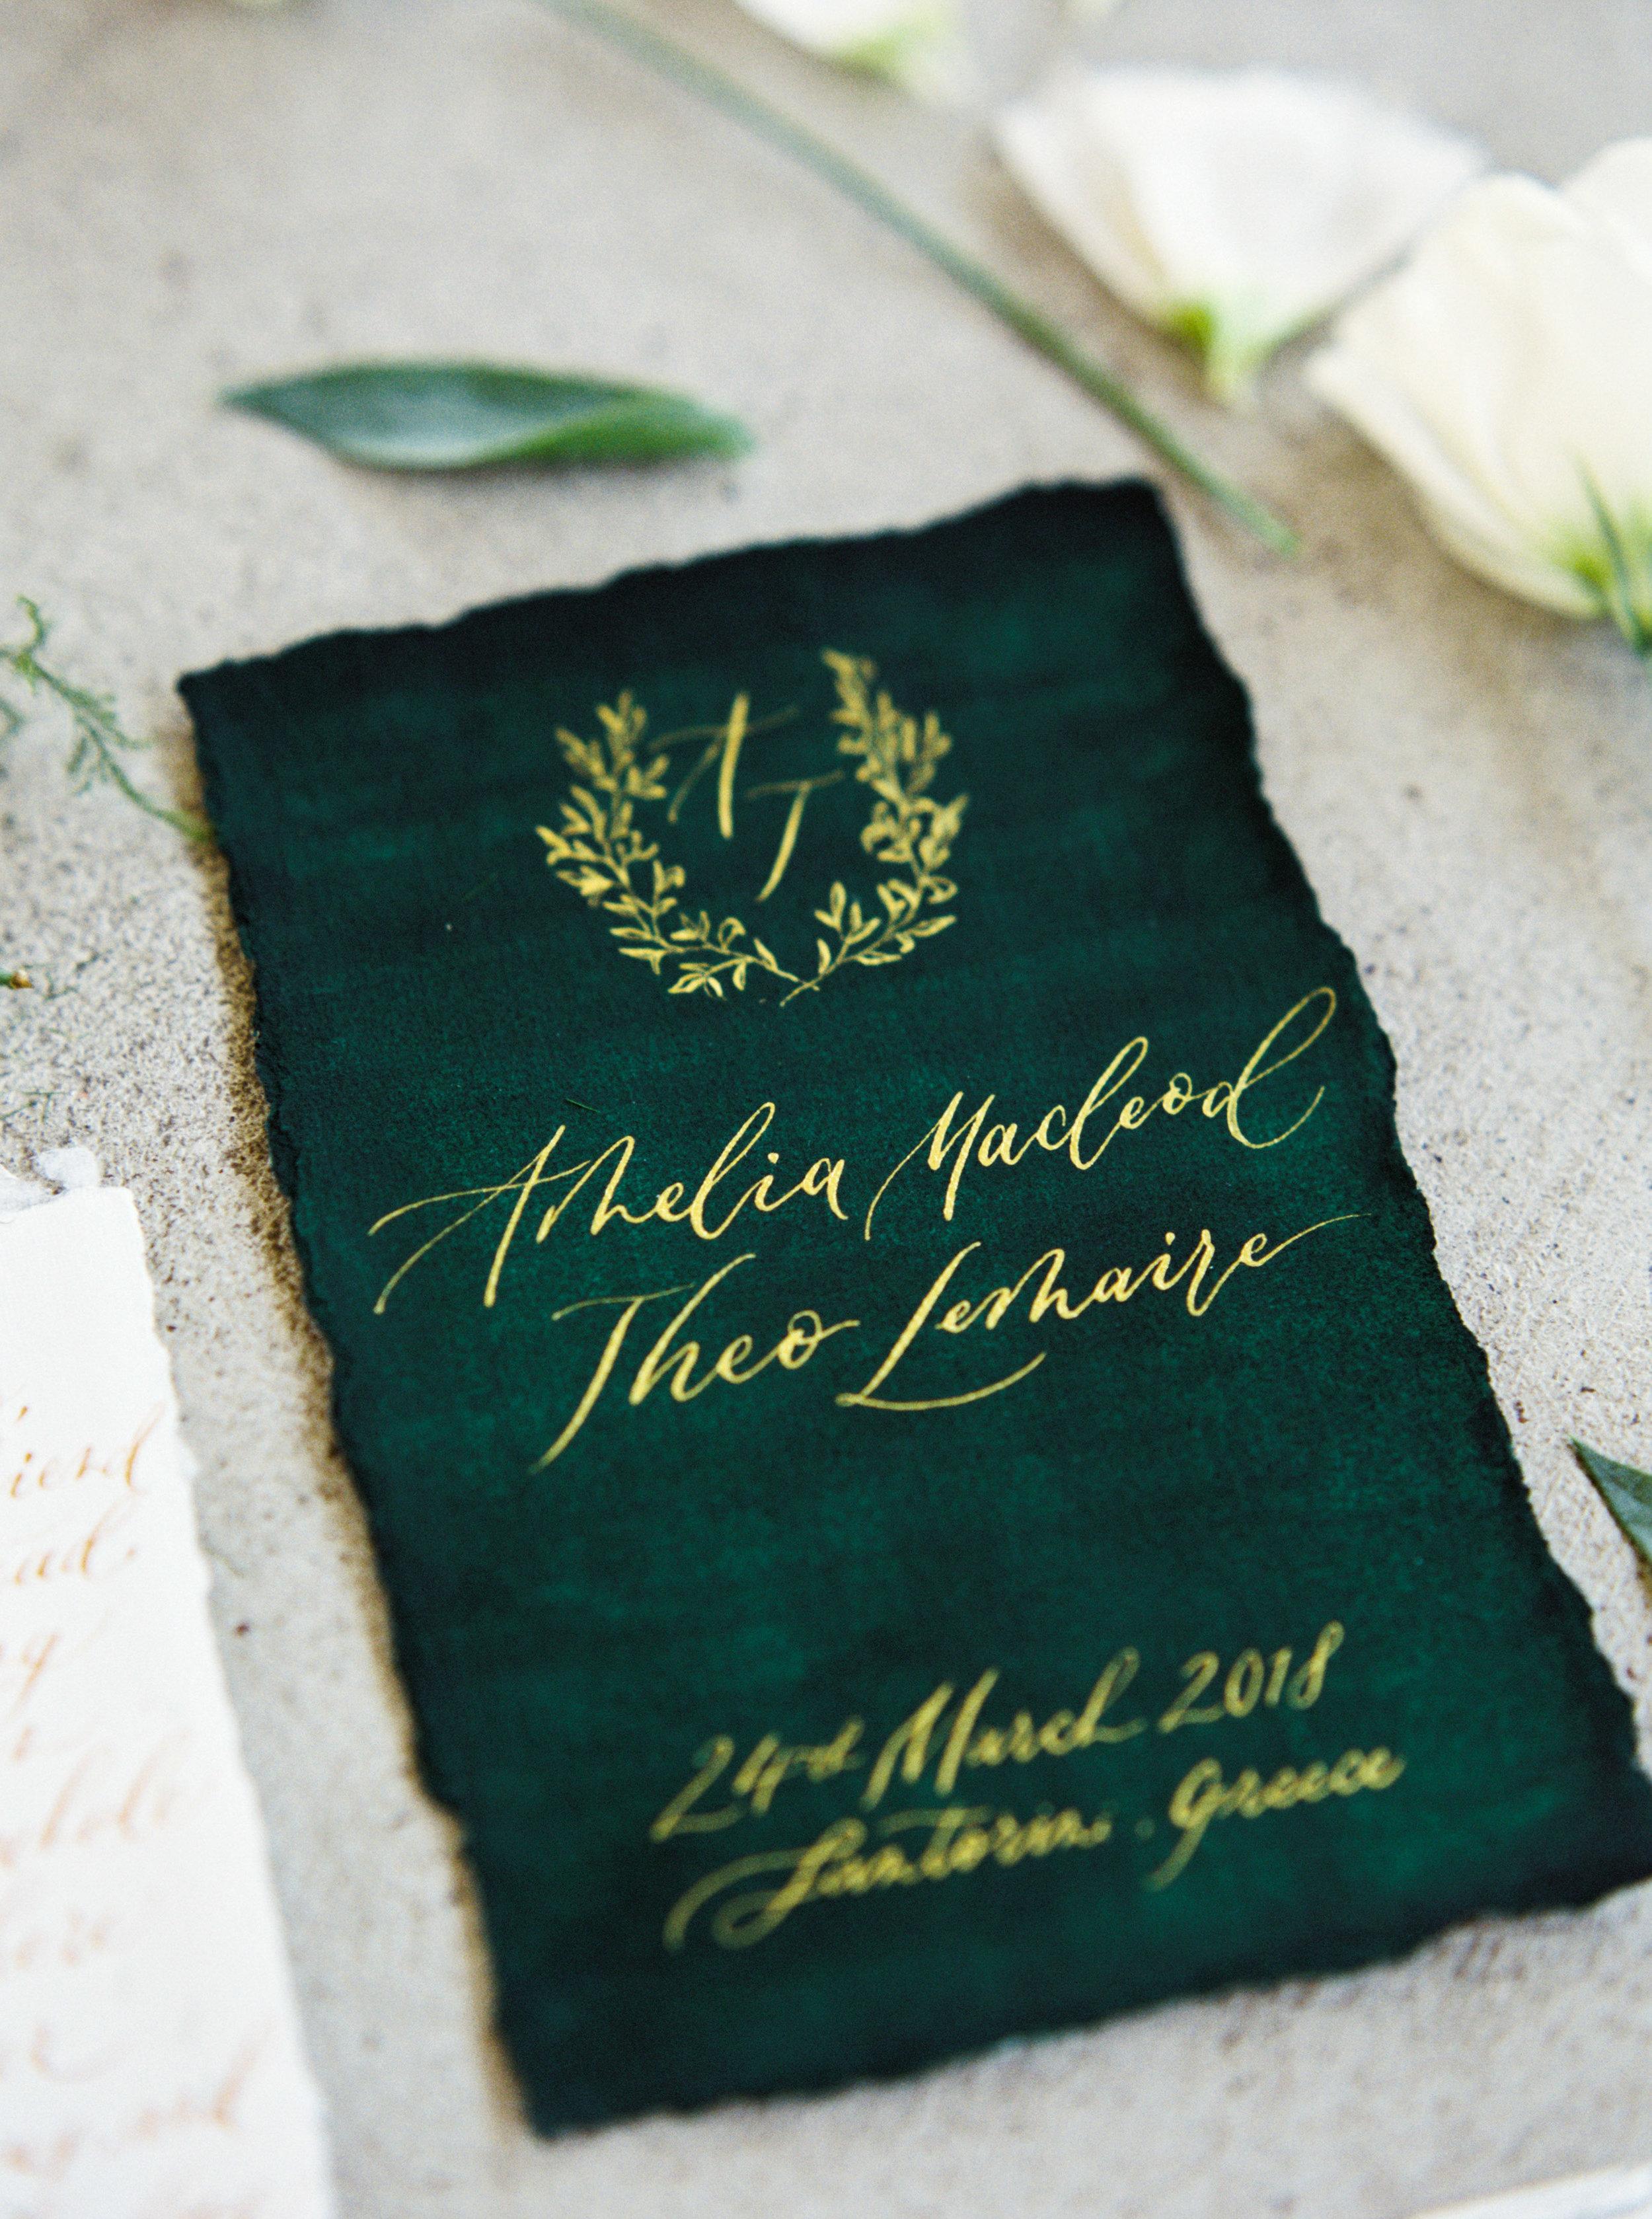 00007- Tamworth NSW Wedding Photographer Sheri McMahon-2.jpg